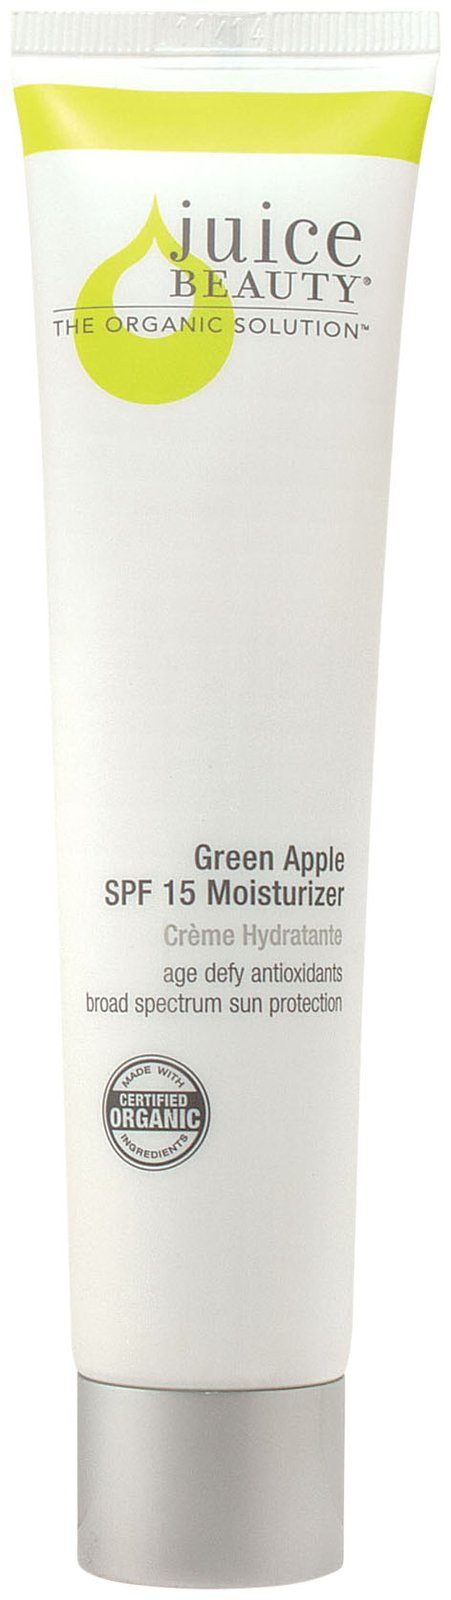 Juice Beauty Green Apple Moisturizer SPF 15 50ml/1.7oz